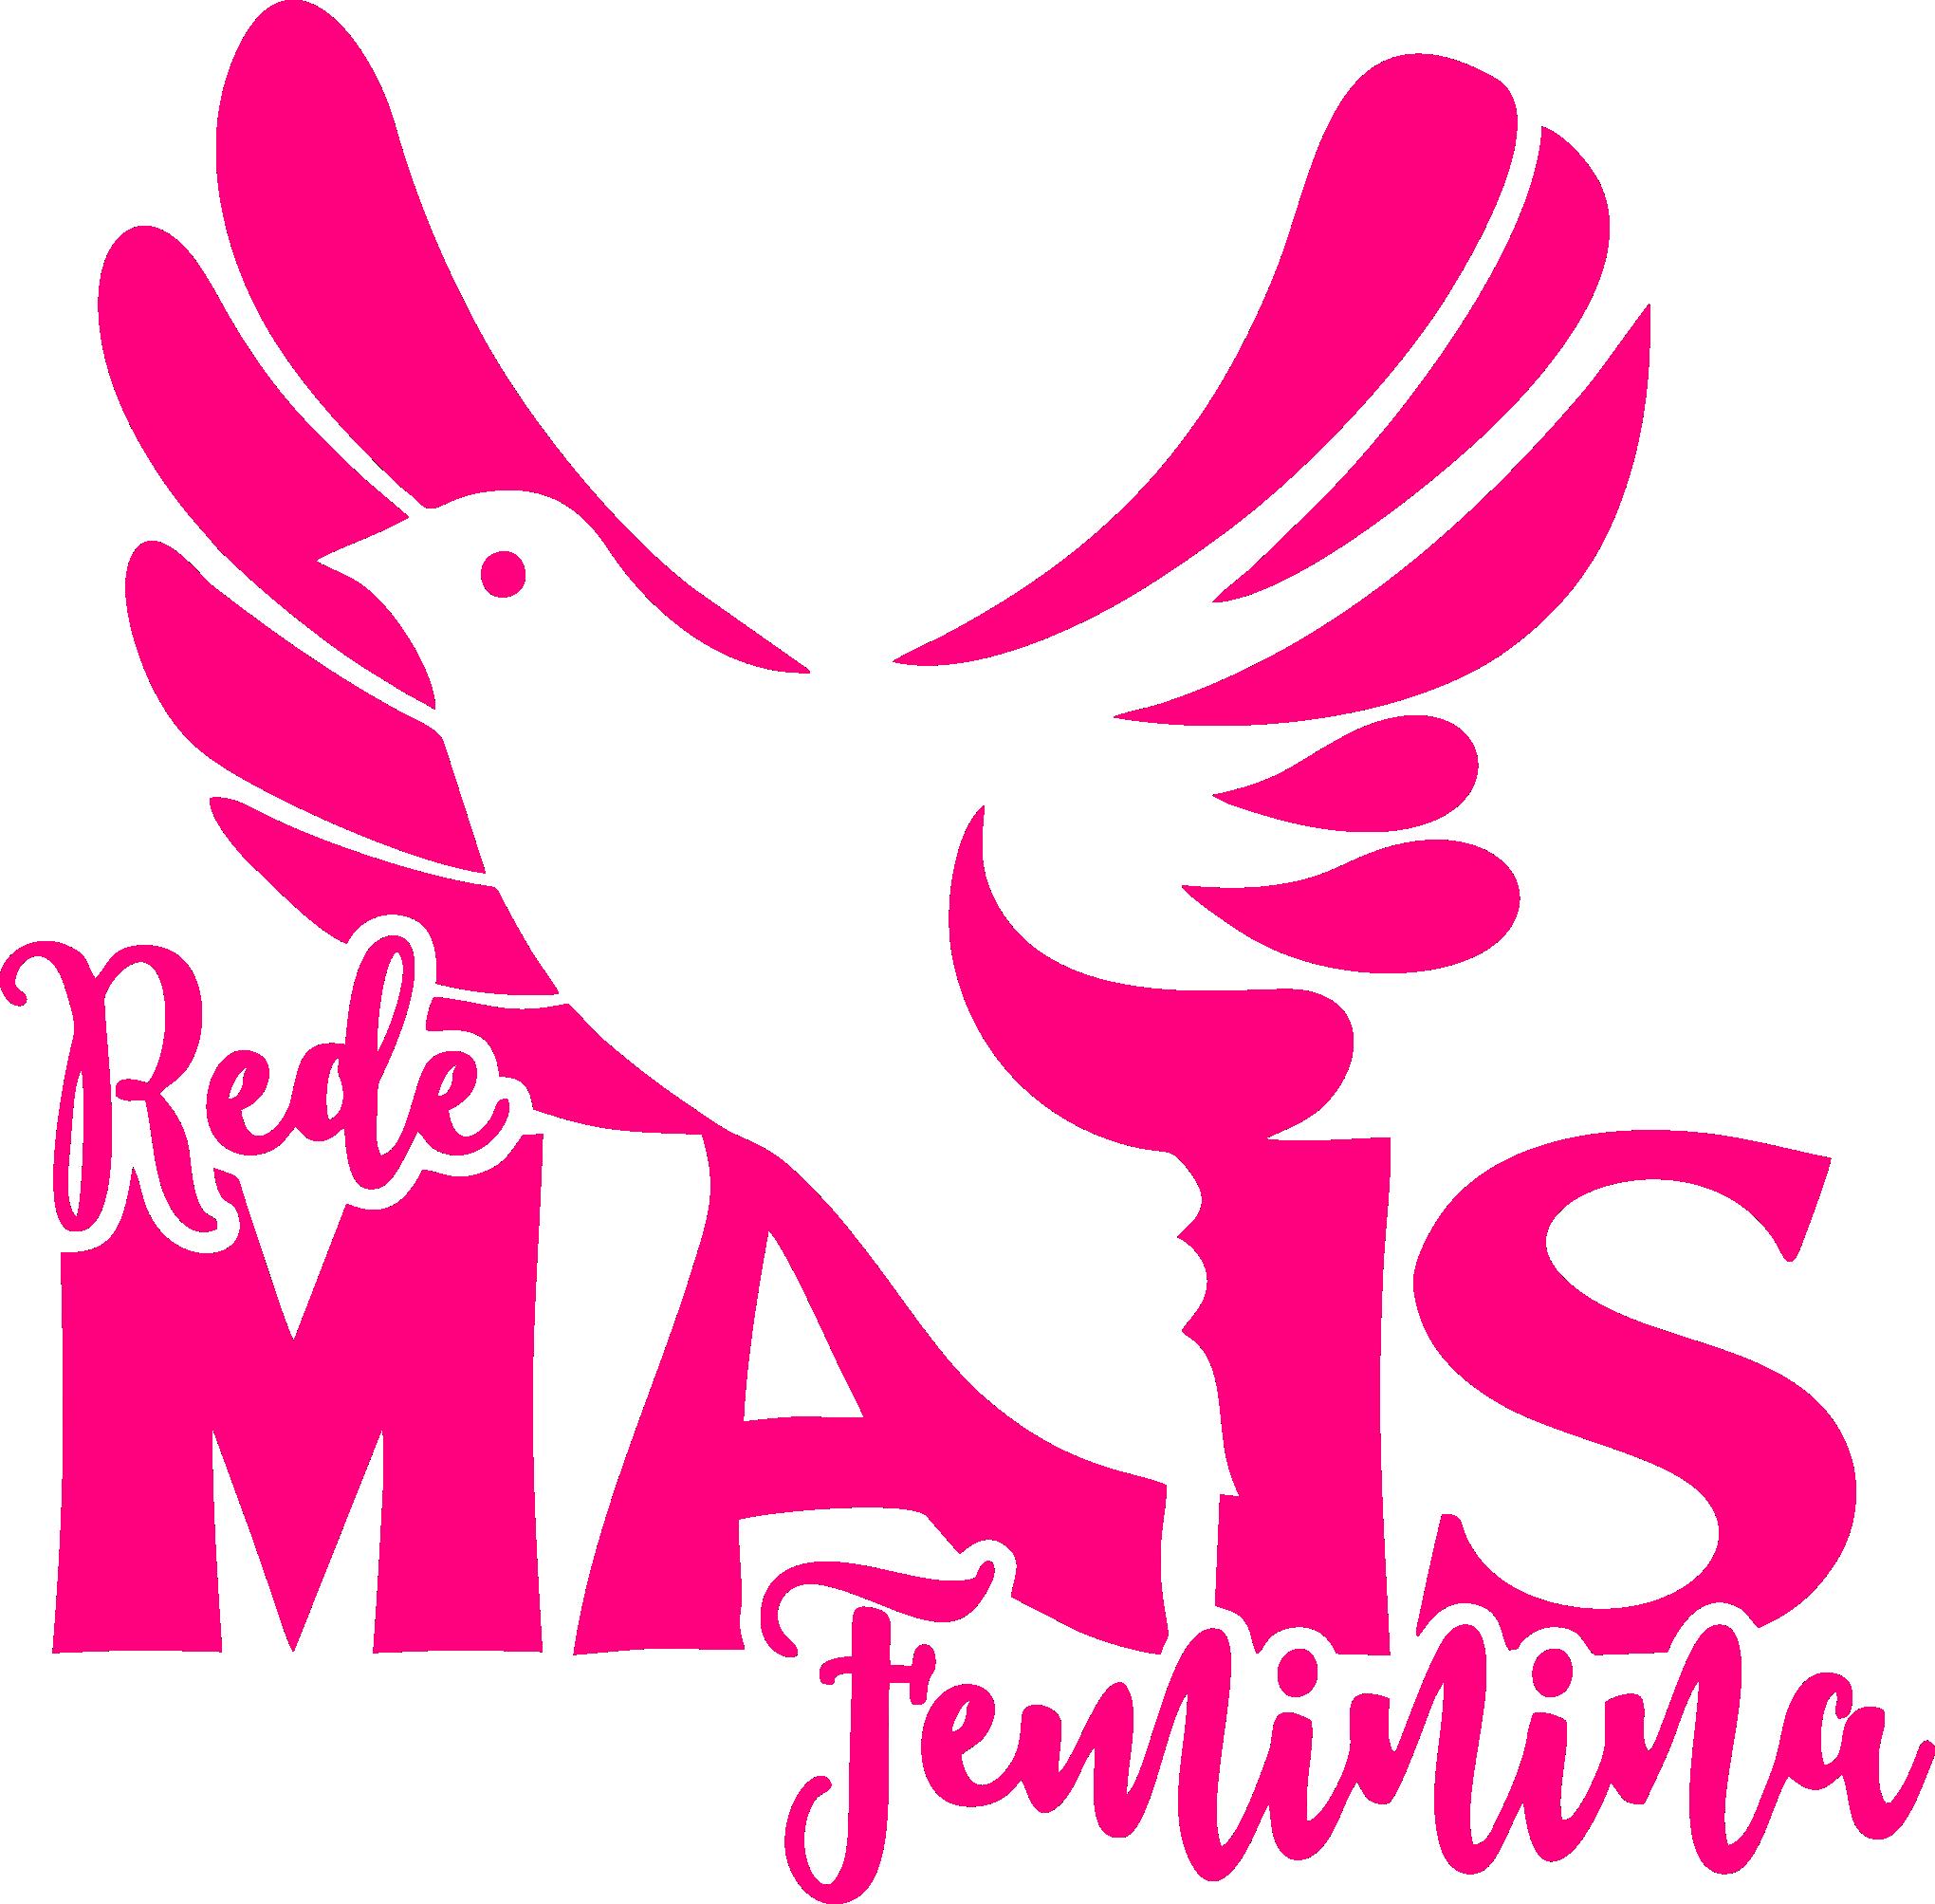 maie_feminina-logo